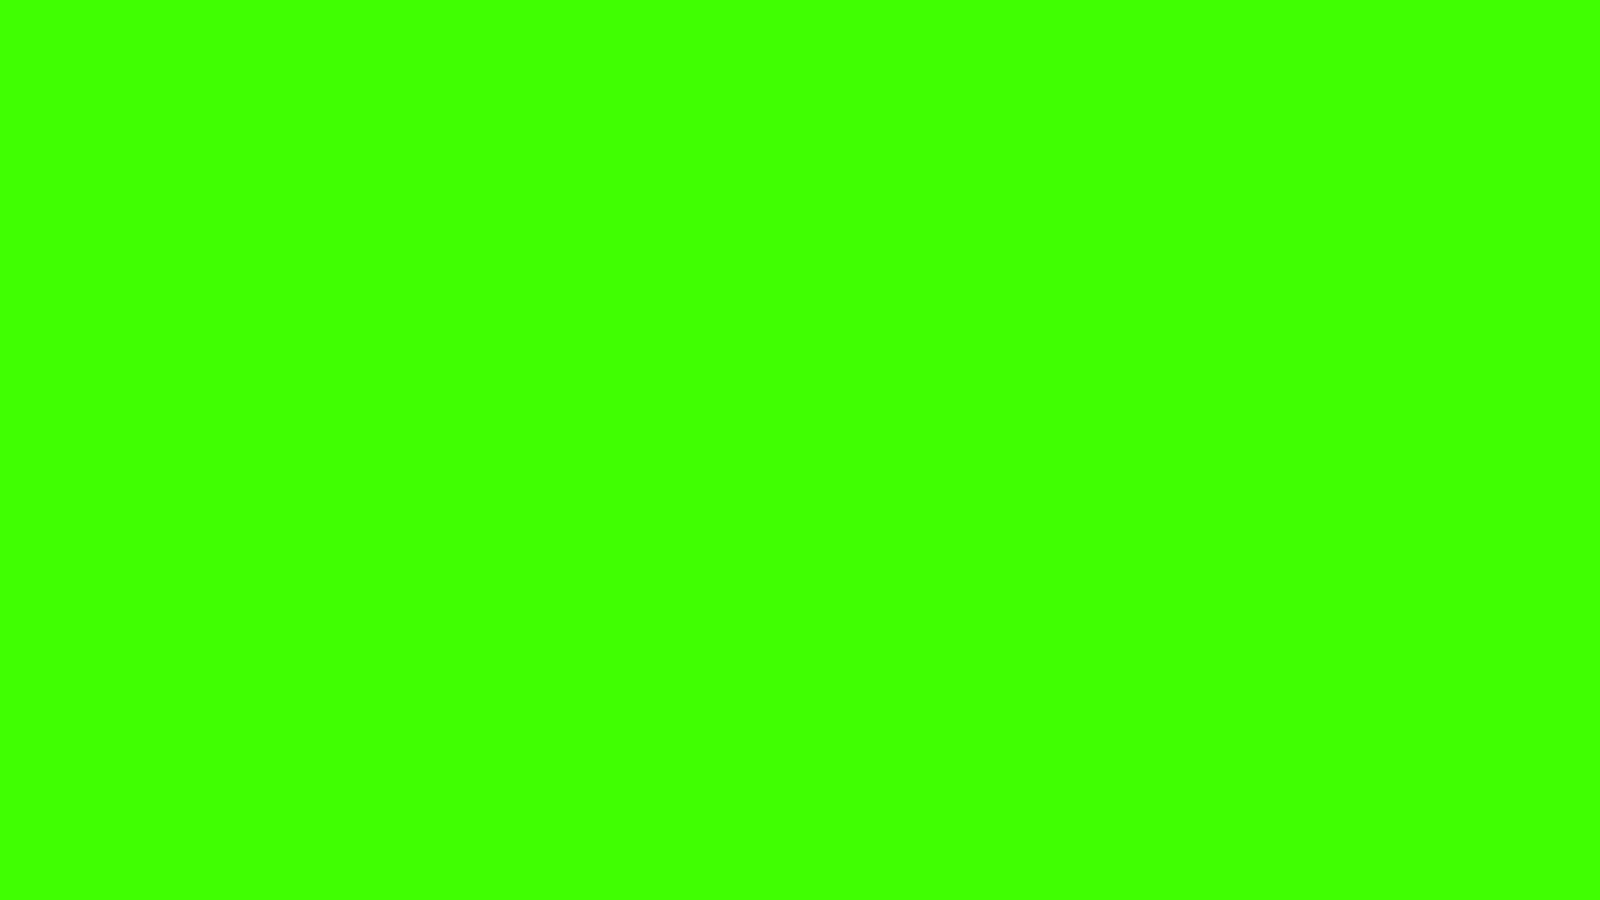 1600x900 Harlequin Solid Color Background